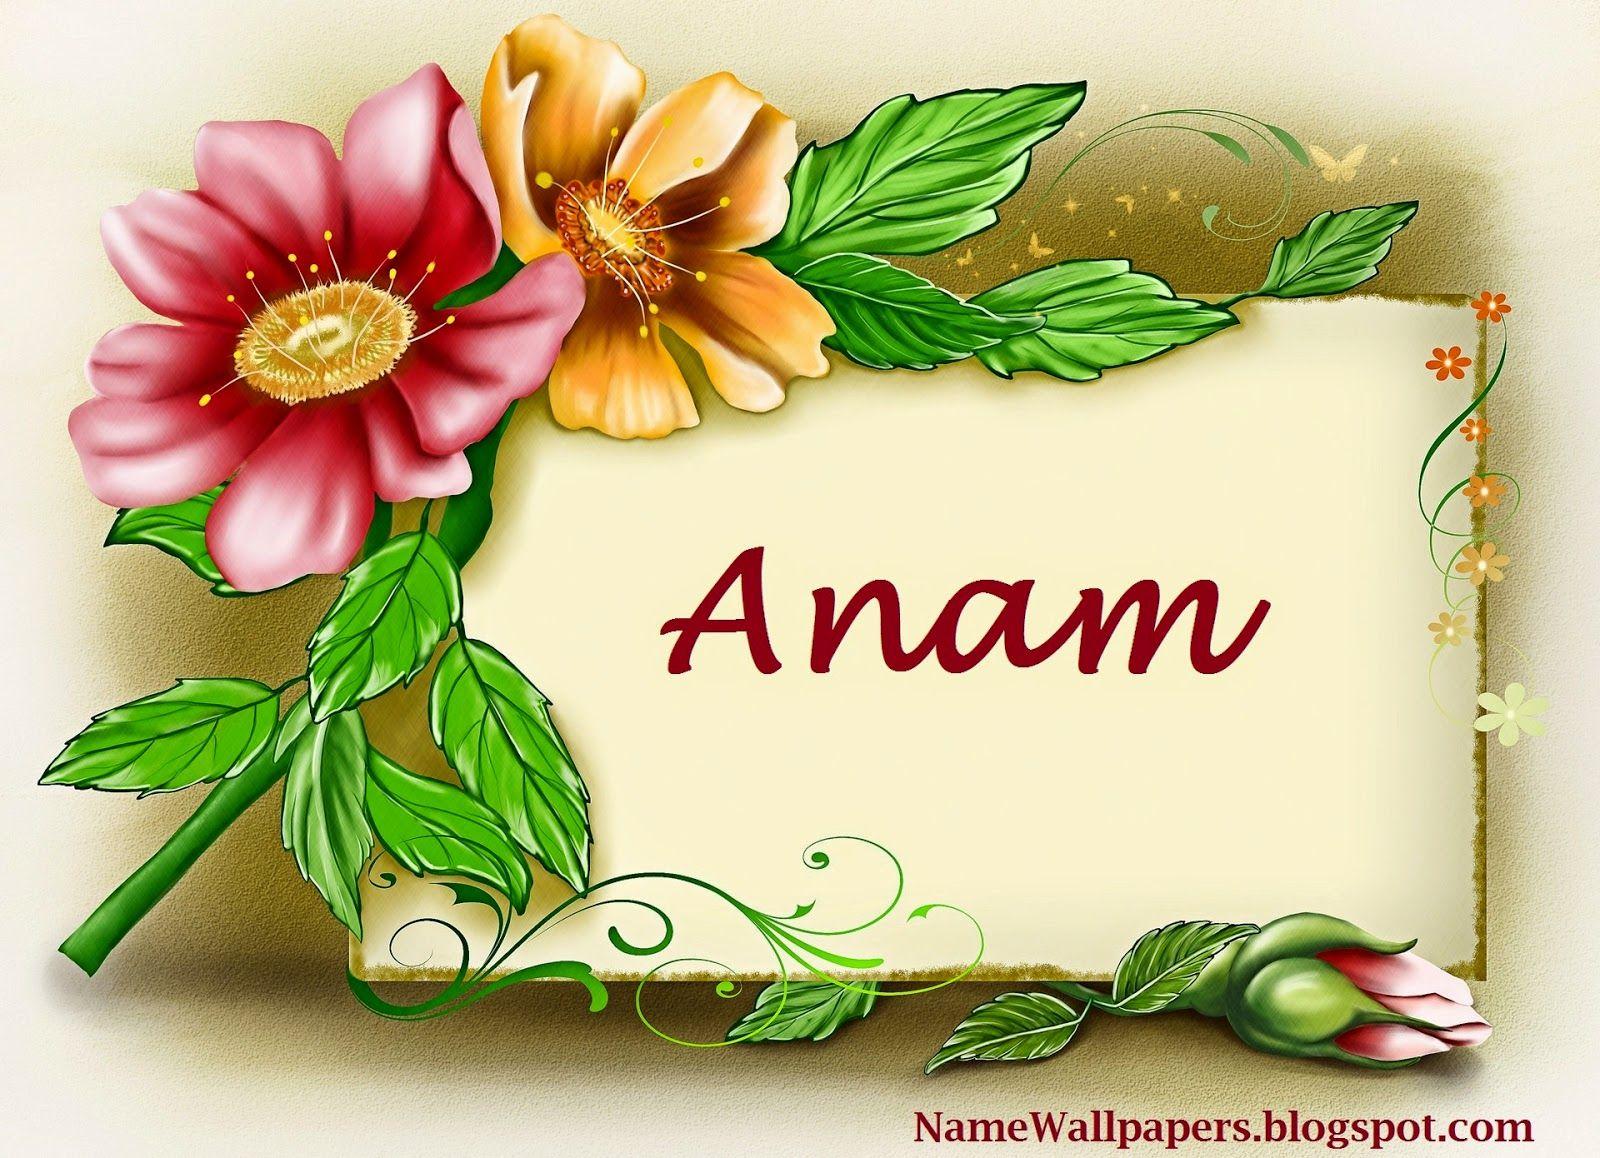 Download Wallpaper Name Anil - 1cf1ae95f48f23afa7ec320a0adde3d0  Image_96815.jpg